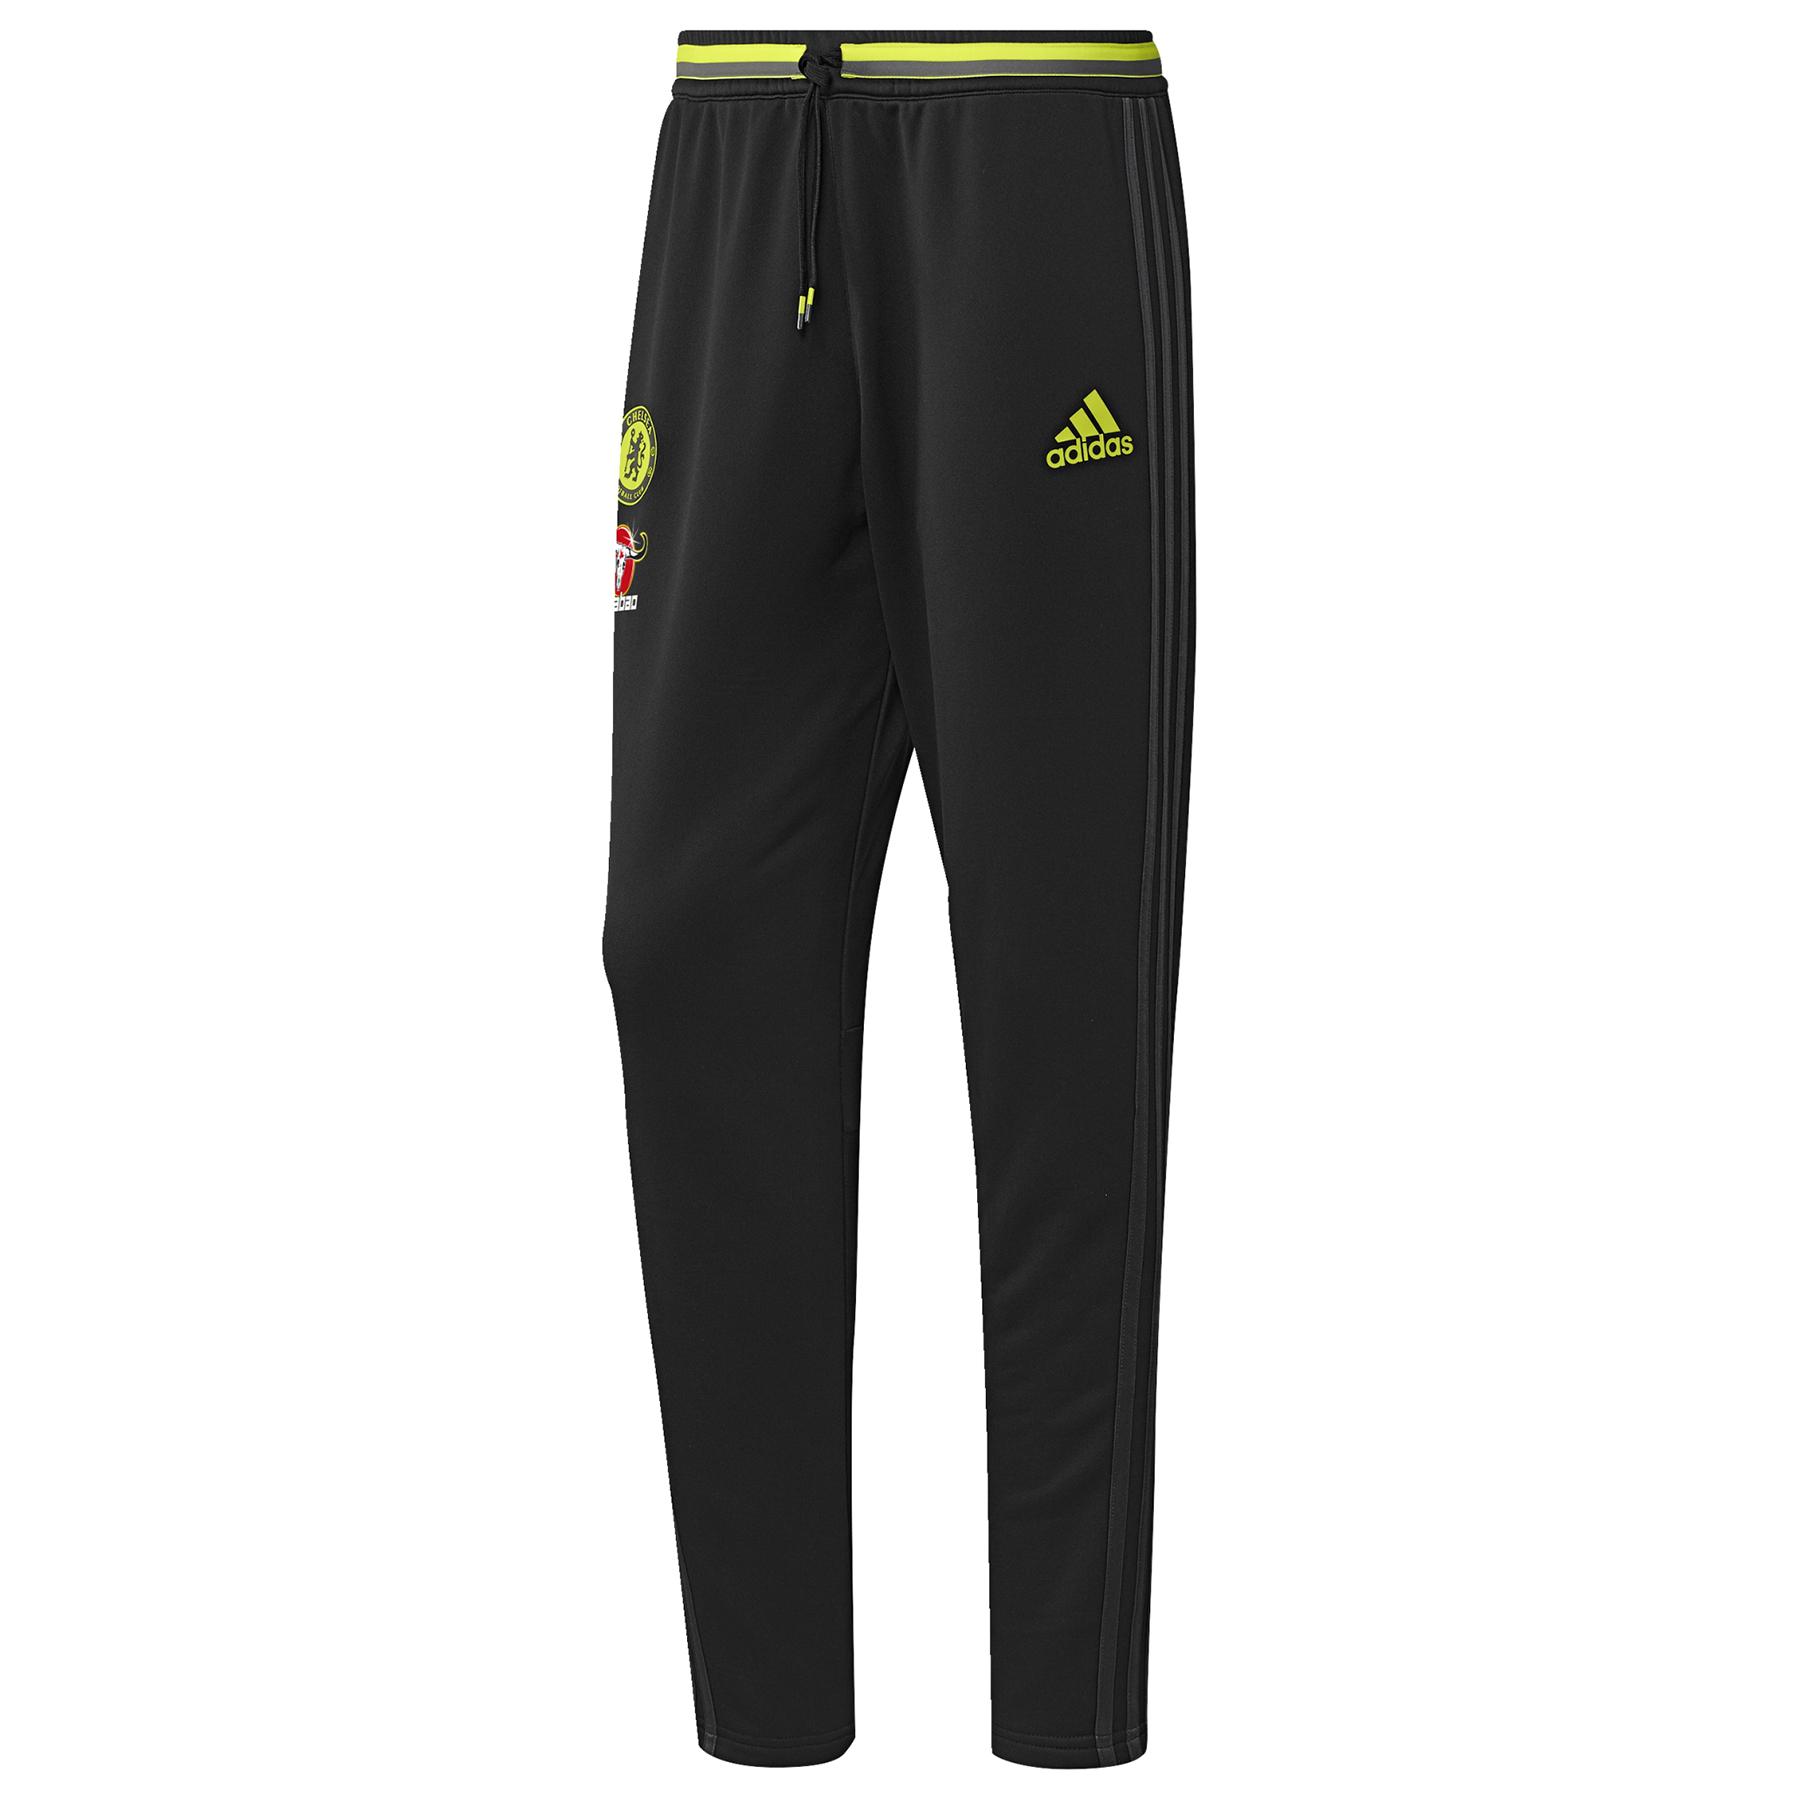 Chelsea Training Pants - Black